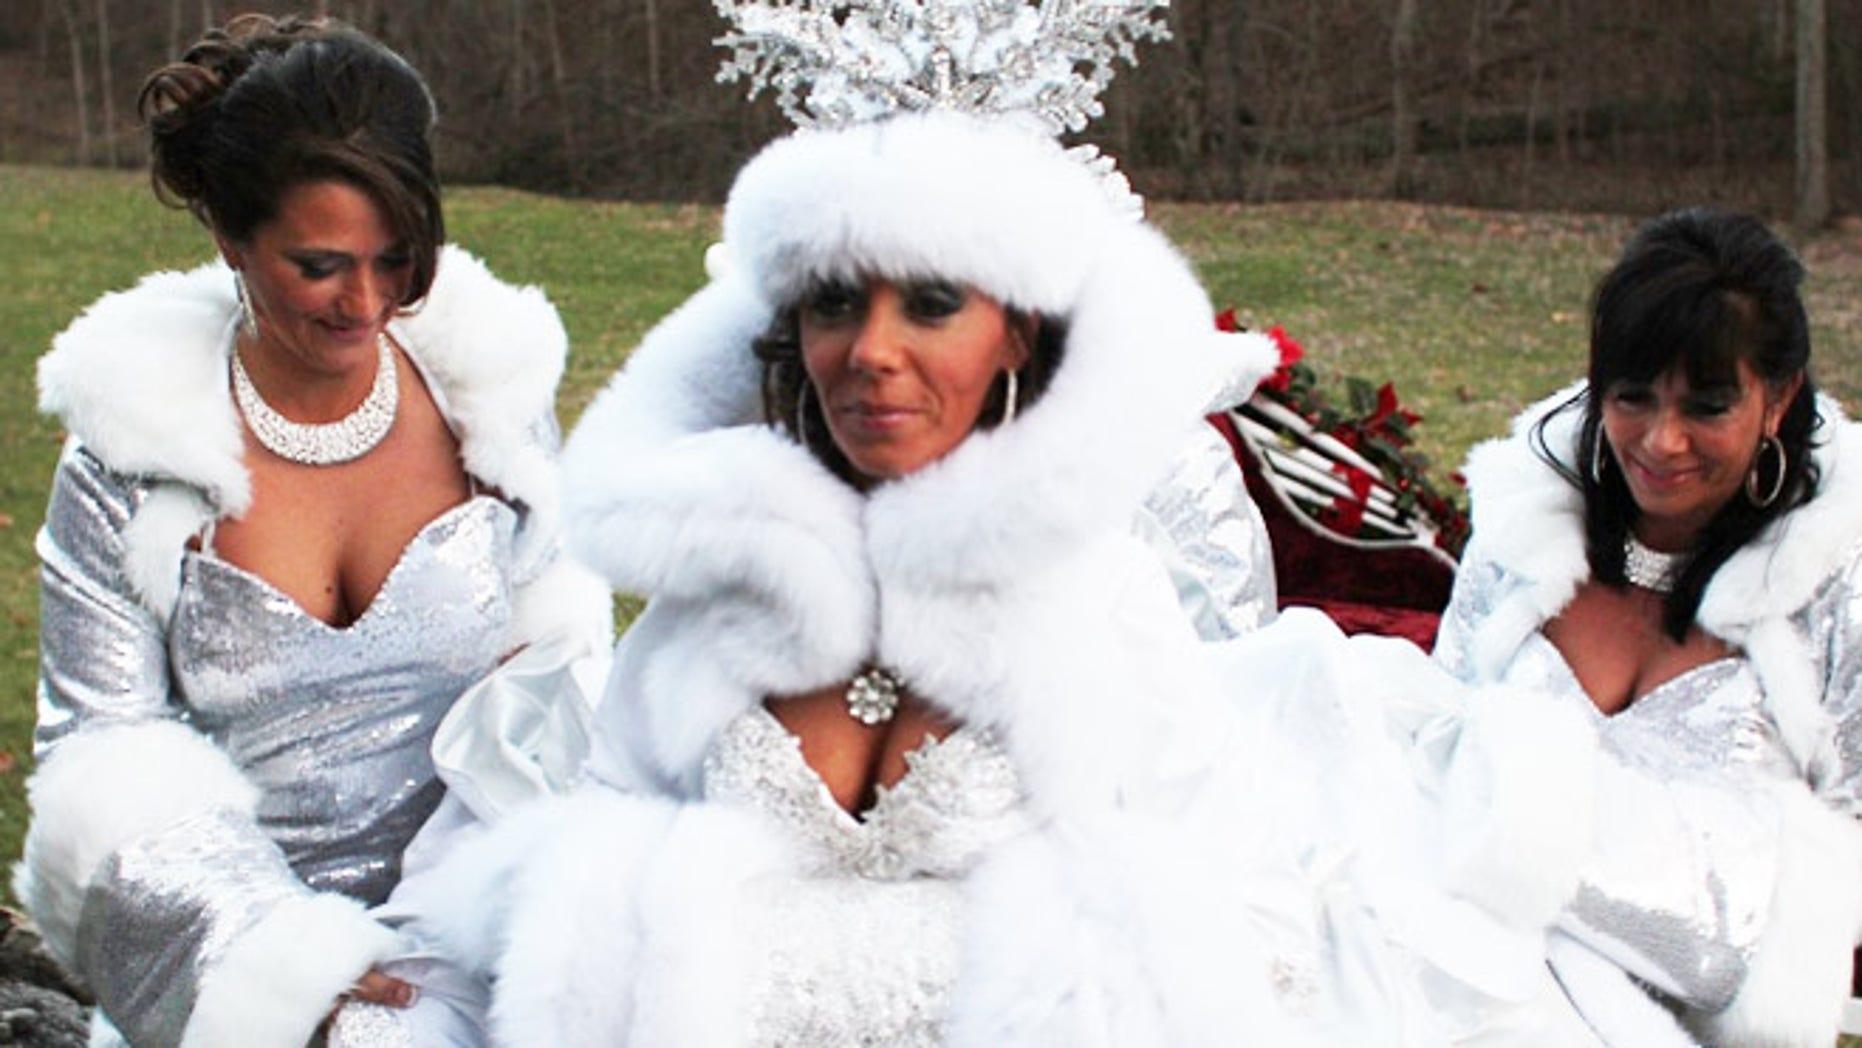 My Big Fat Gypsy Wedding Stars Believe In Incest Not Pre Marital